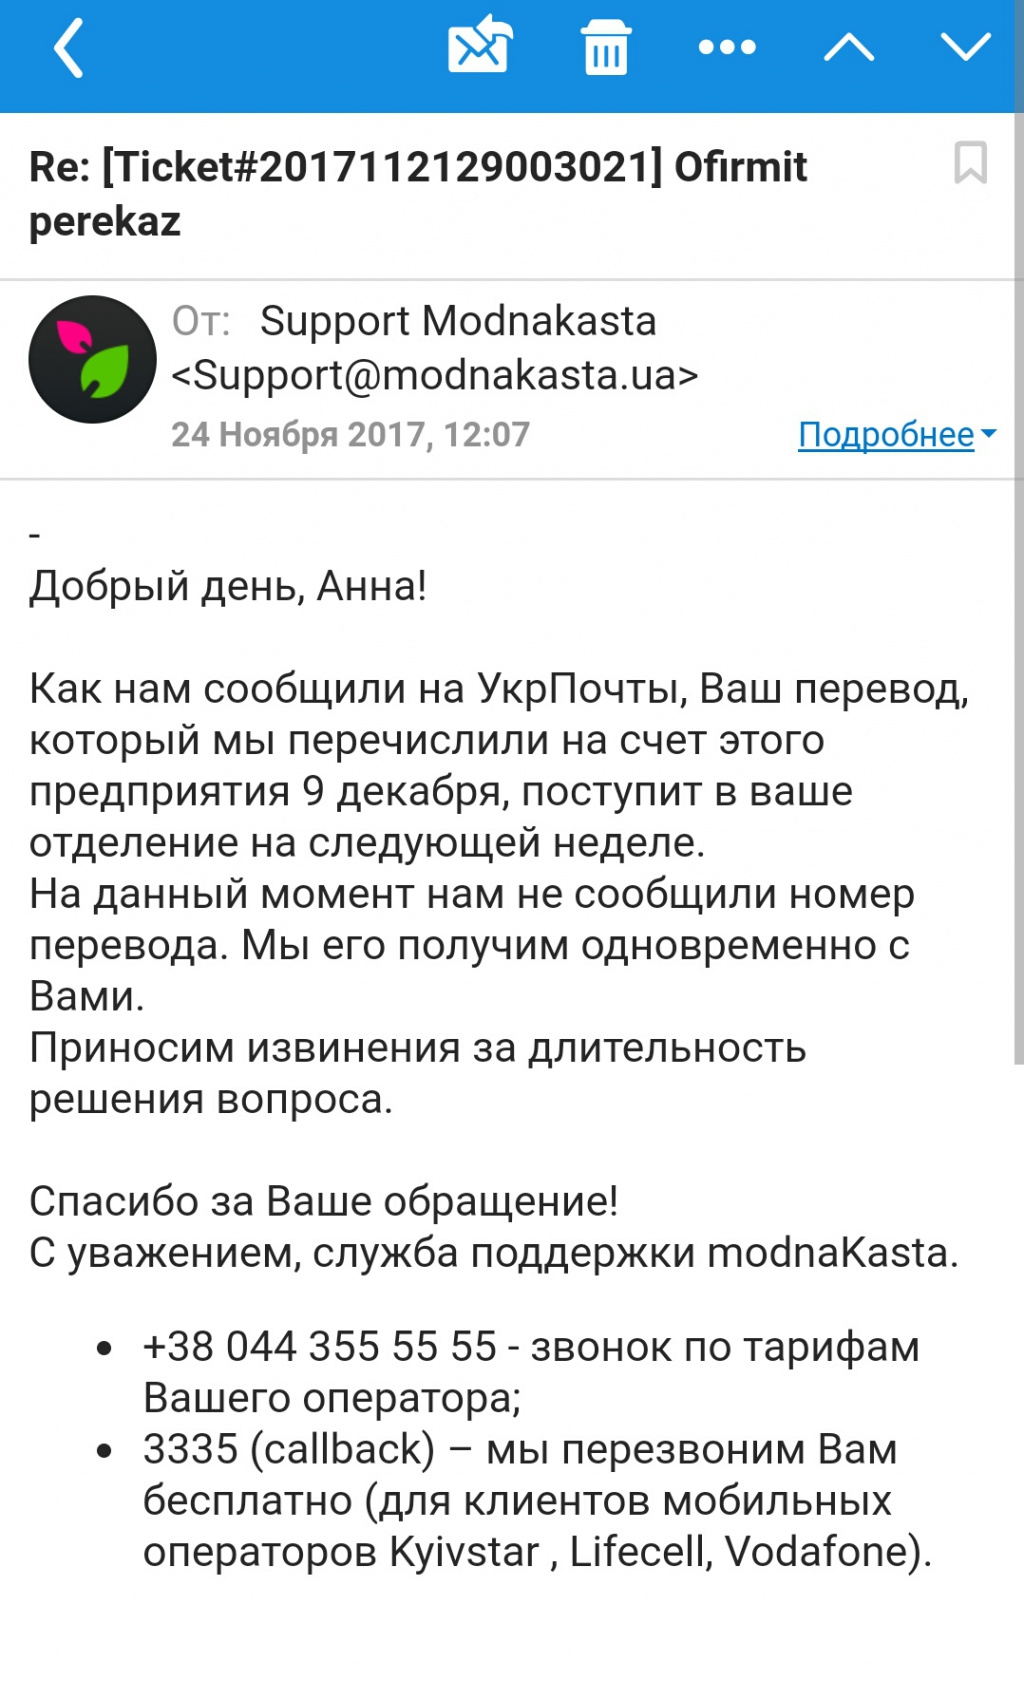 modnaKasta - не возвращают деньги.